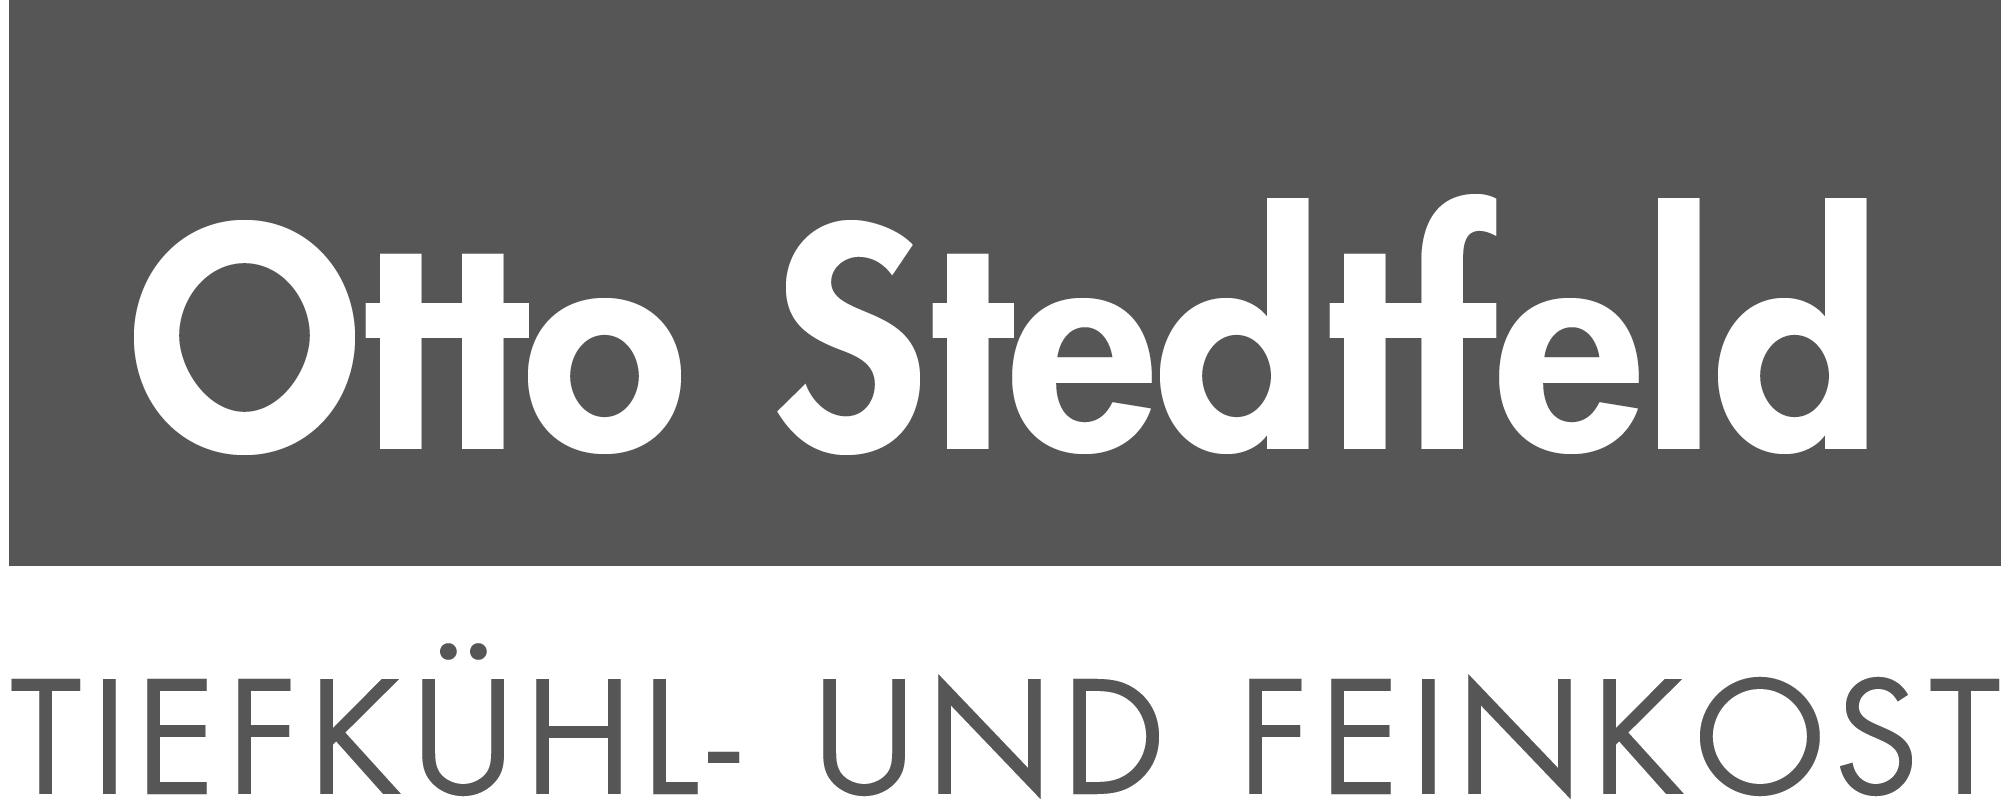 Otto Stedtfeld GmbH